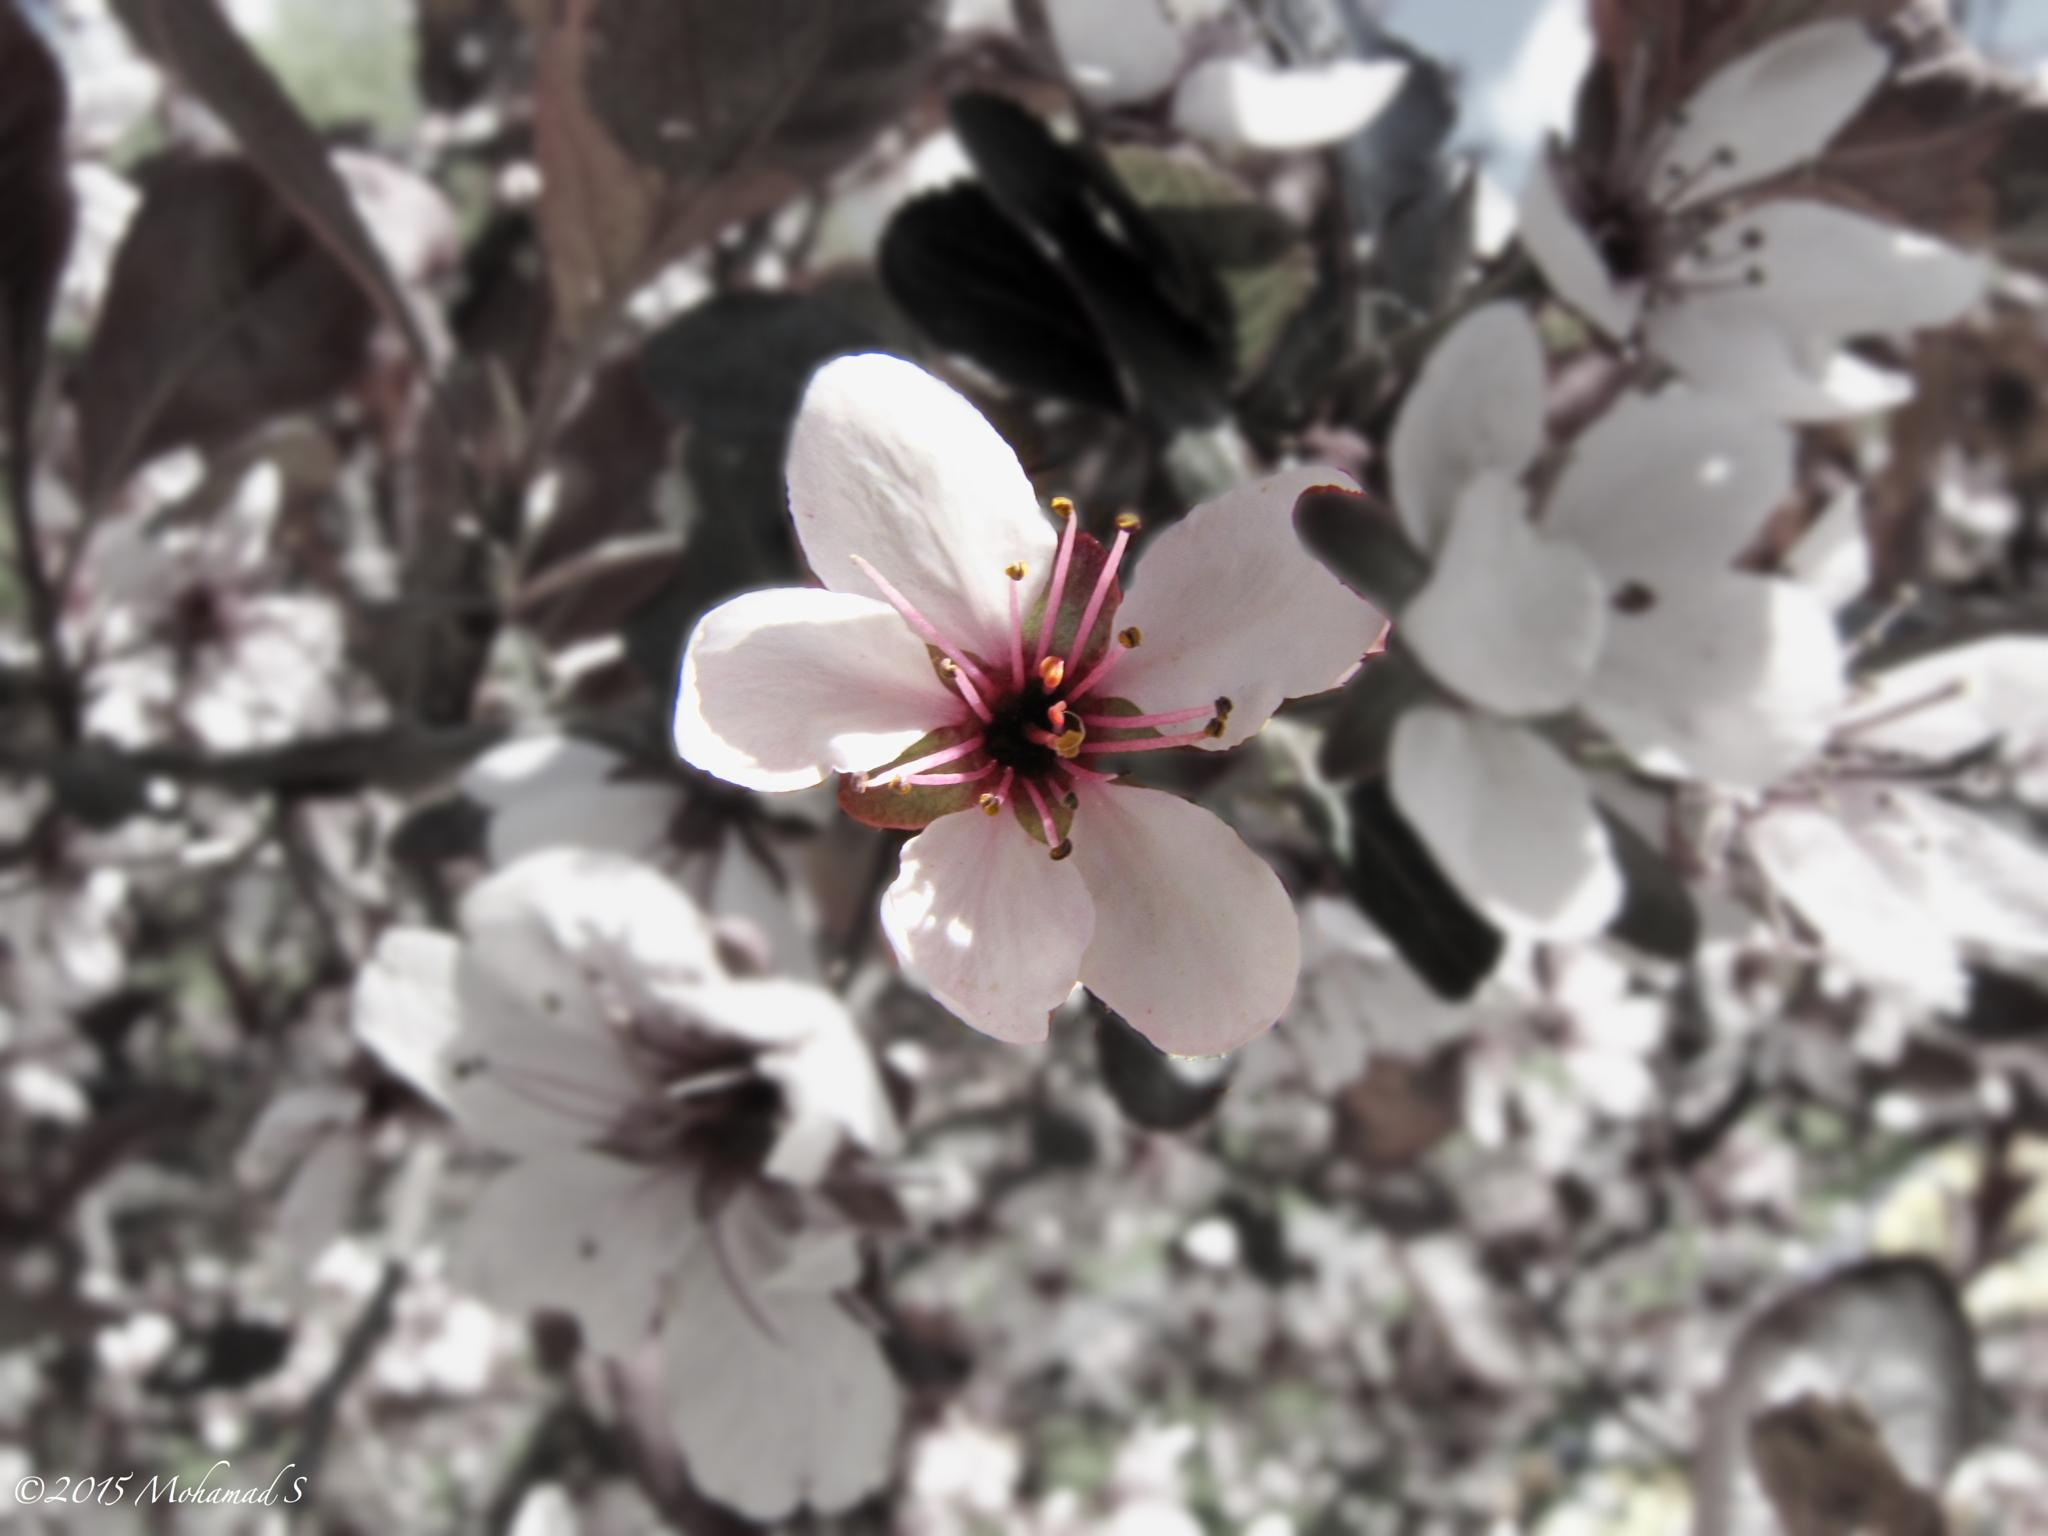 flowerssssssssssss by Mohamad Salahaldin